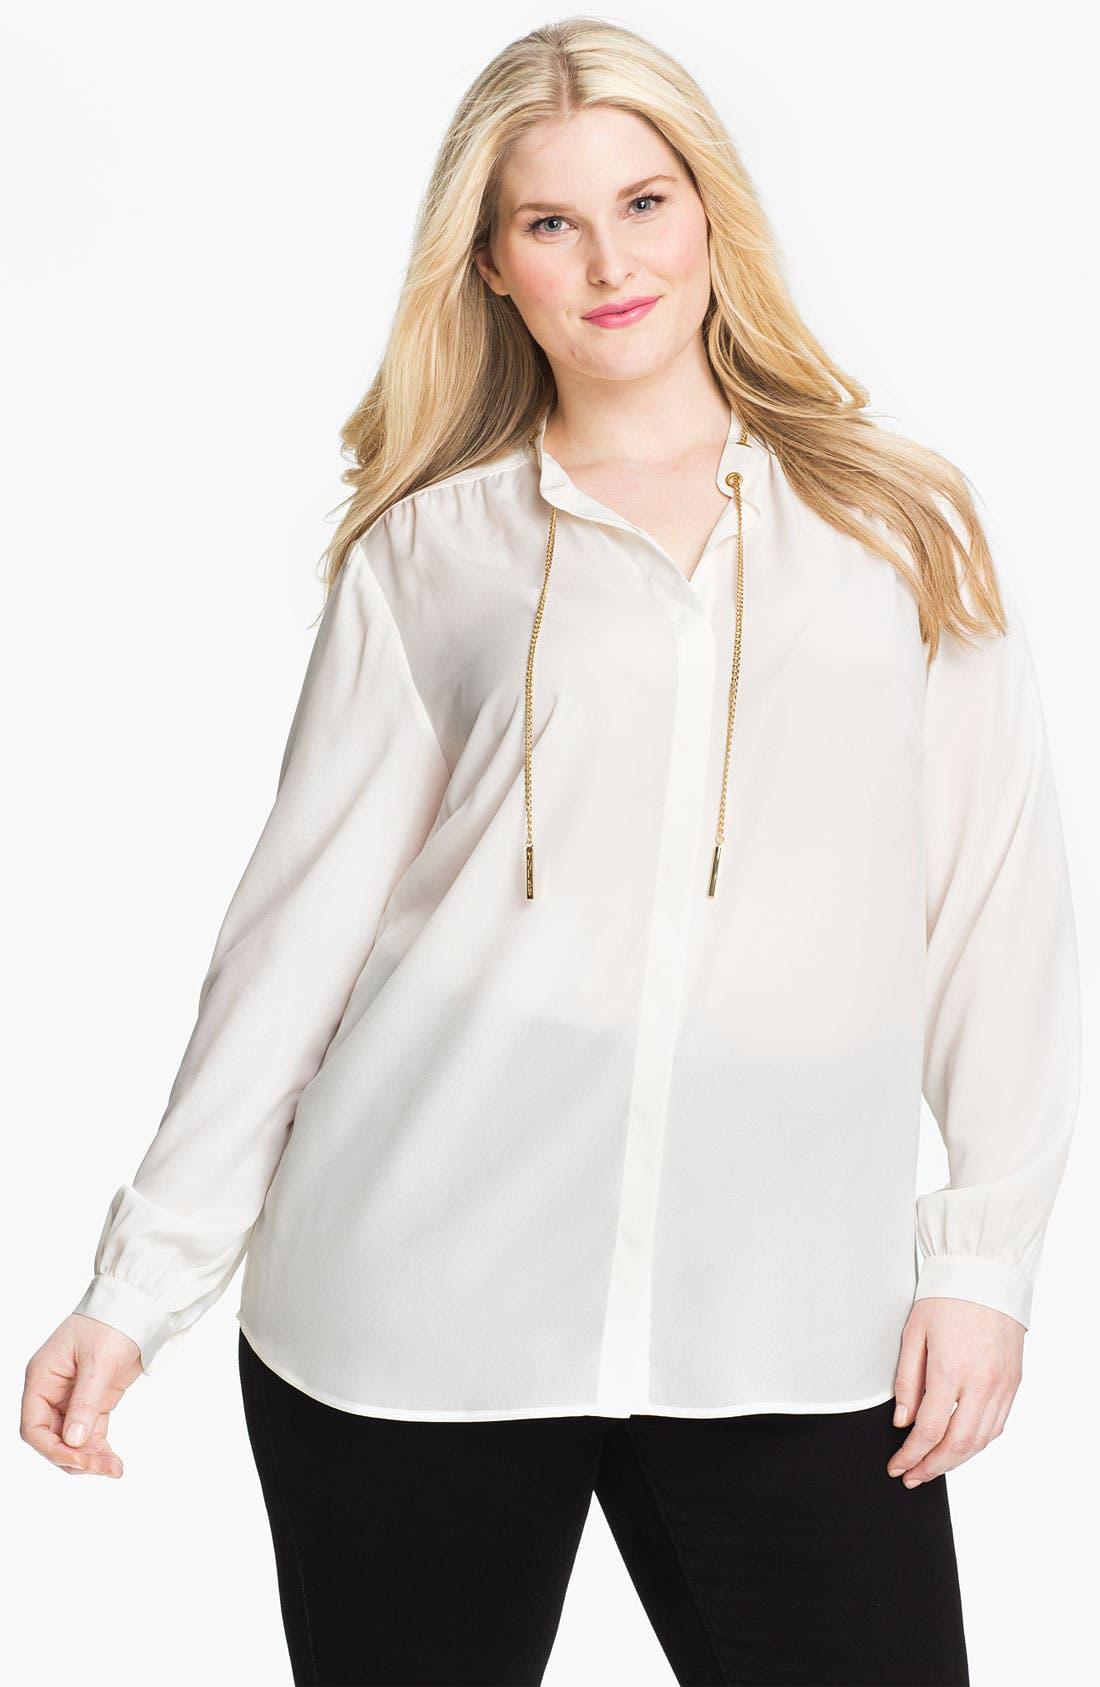 Alternate Image 1 Selected - MICHAEL Michael Kors Chain Detail Shirt (Plus)